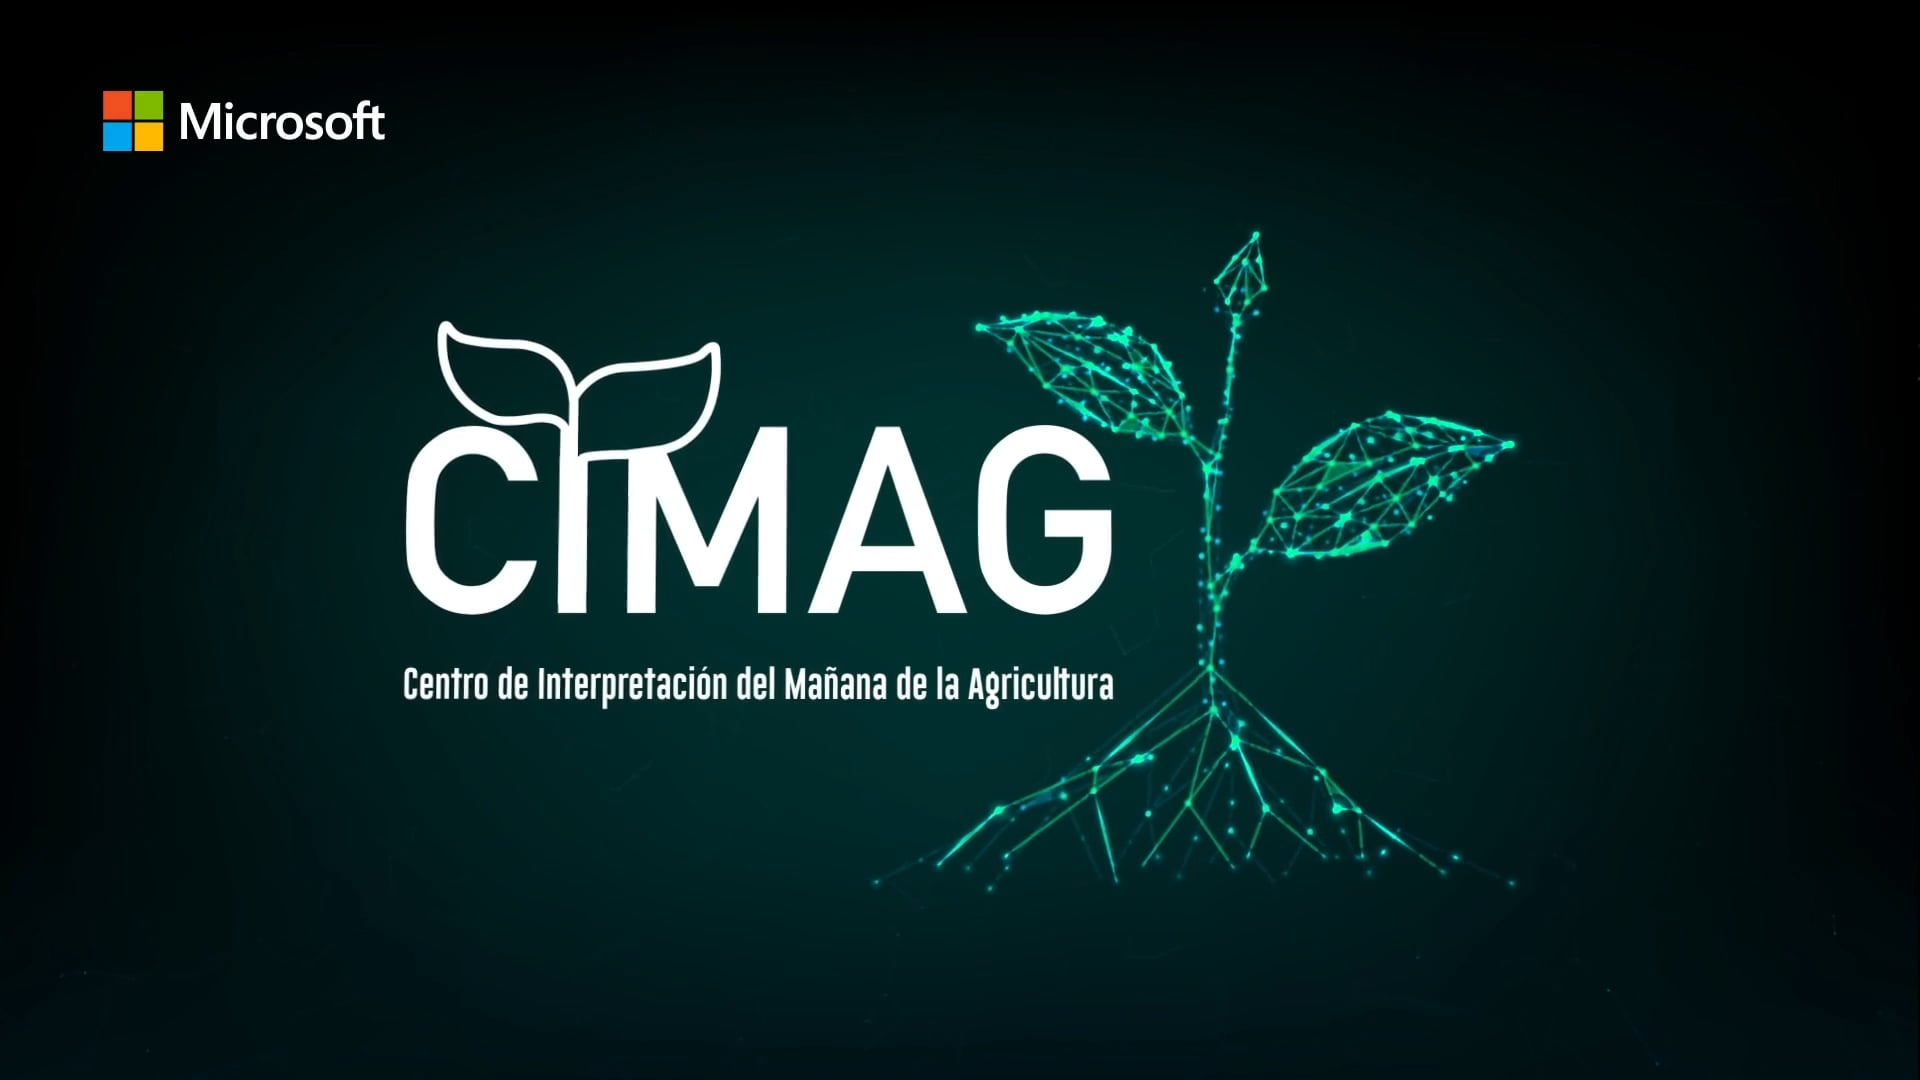 CIMAG, Microsoft - IICA